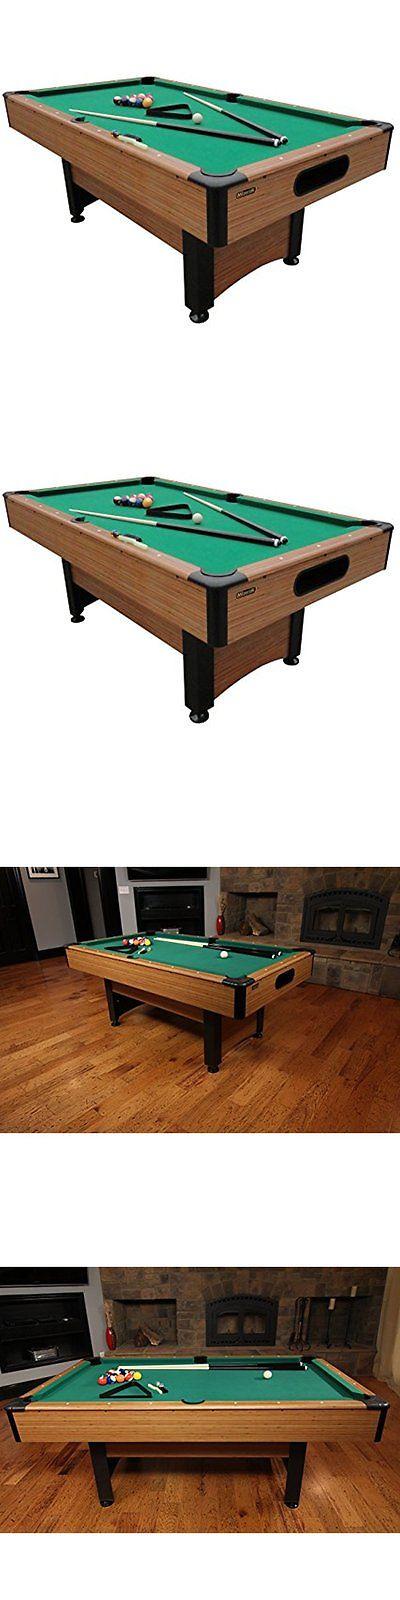 Tables Tables Mizerak Dynasty Space Saver Billiard Table - Mizerak space saver pool table